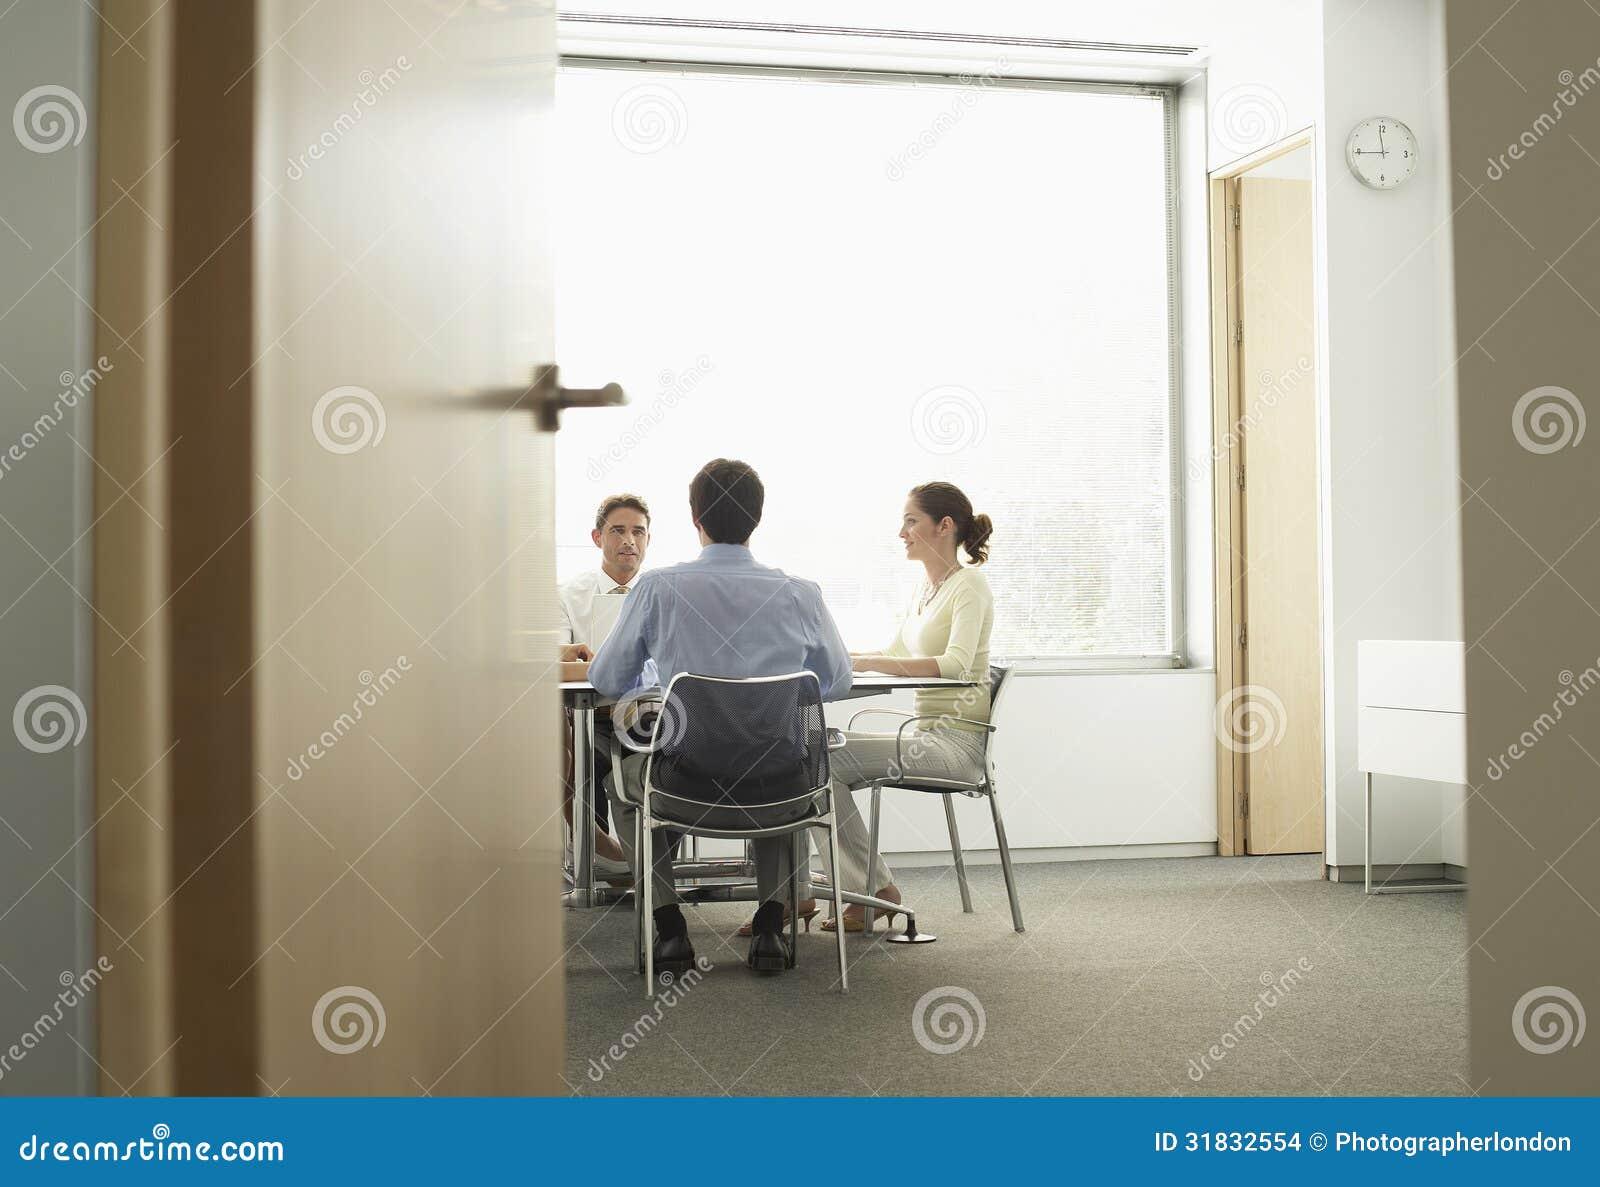 Businesspeople που διοργανώνει μια συνεδρίαση στην αίθουσα συνεδριάσεων